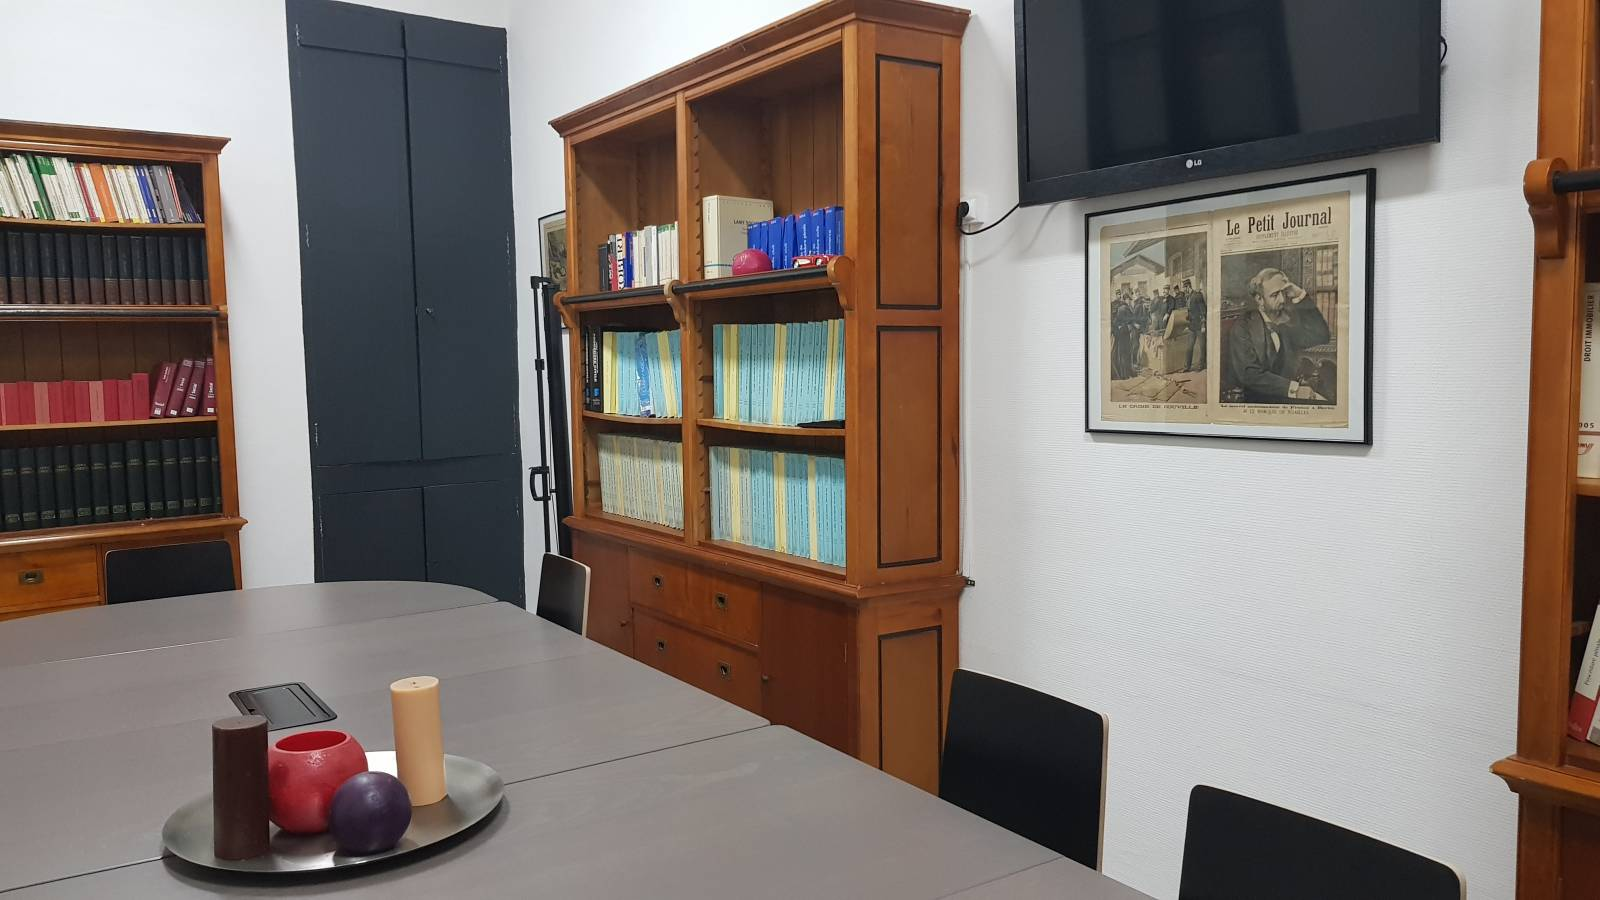 Cabinet d avocats marseille - Cabinet d avocats marseille ...